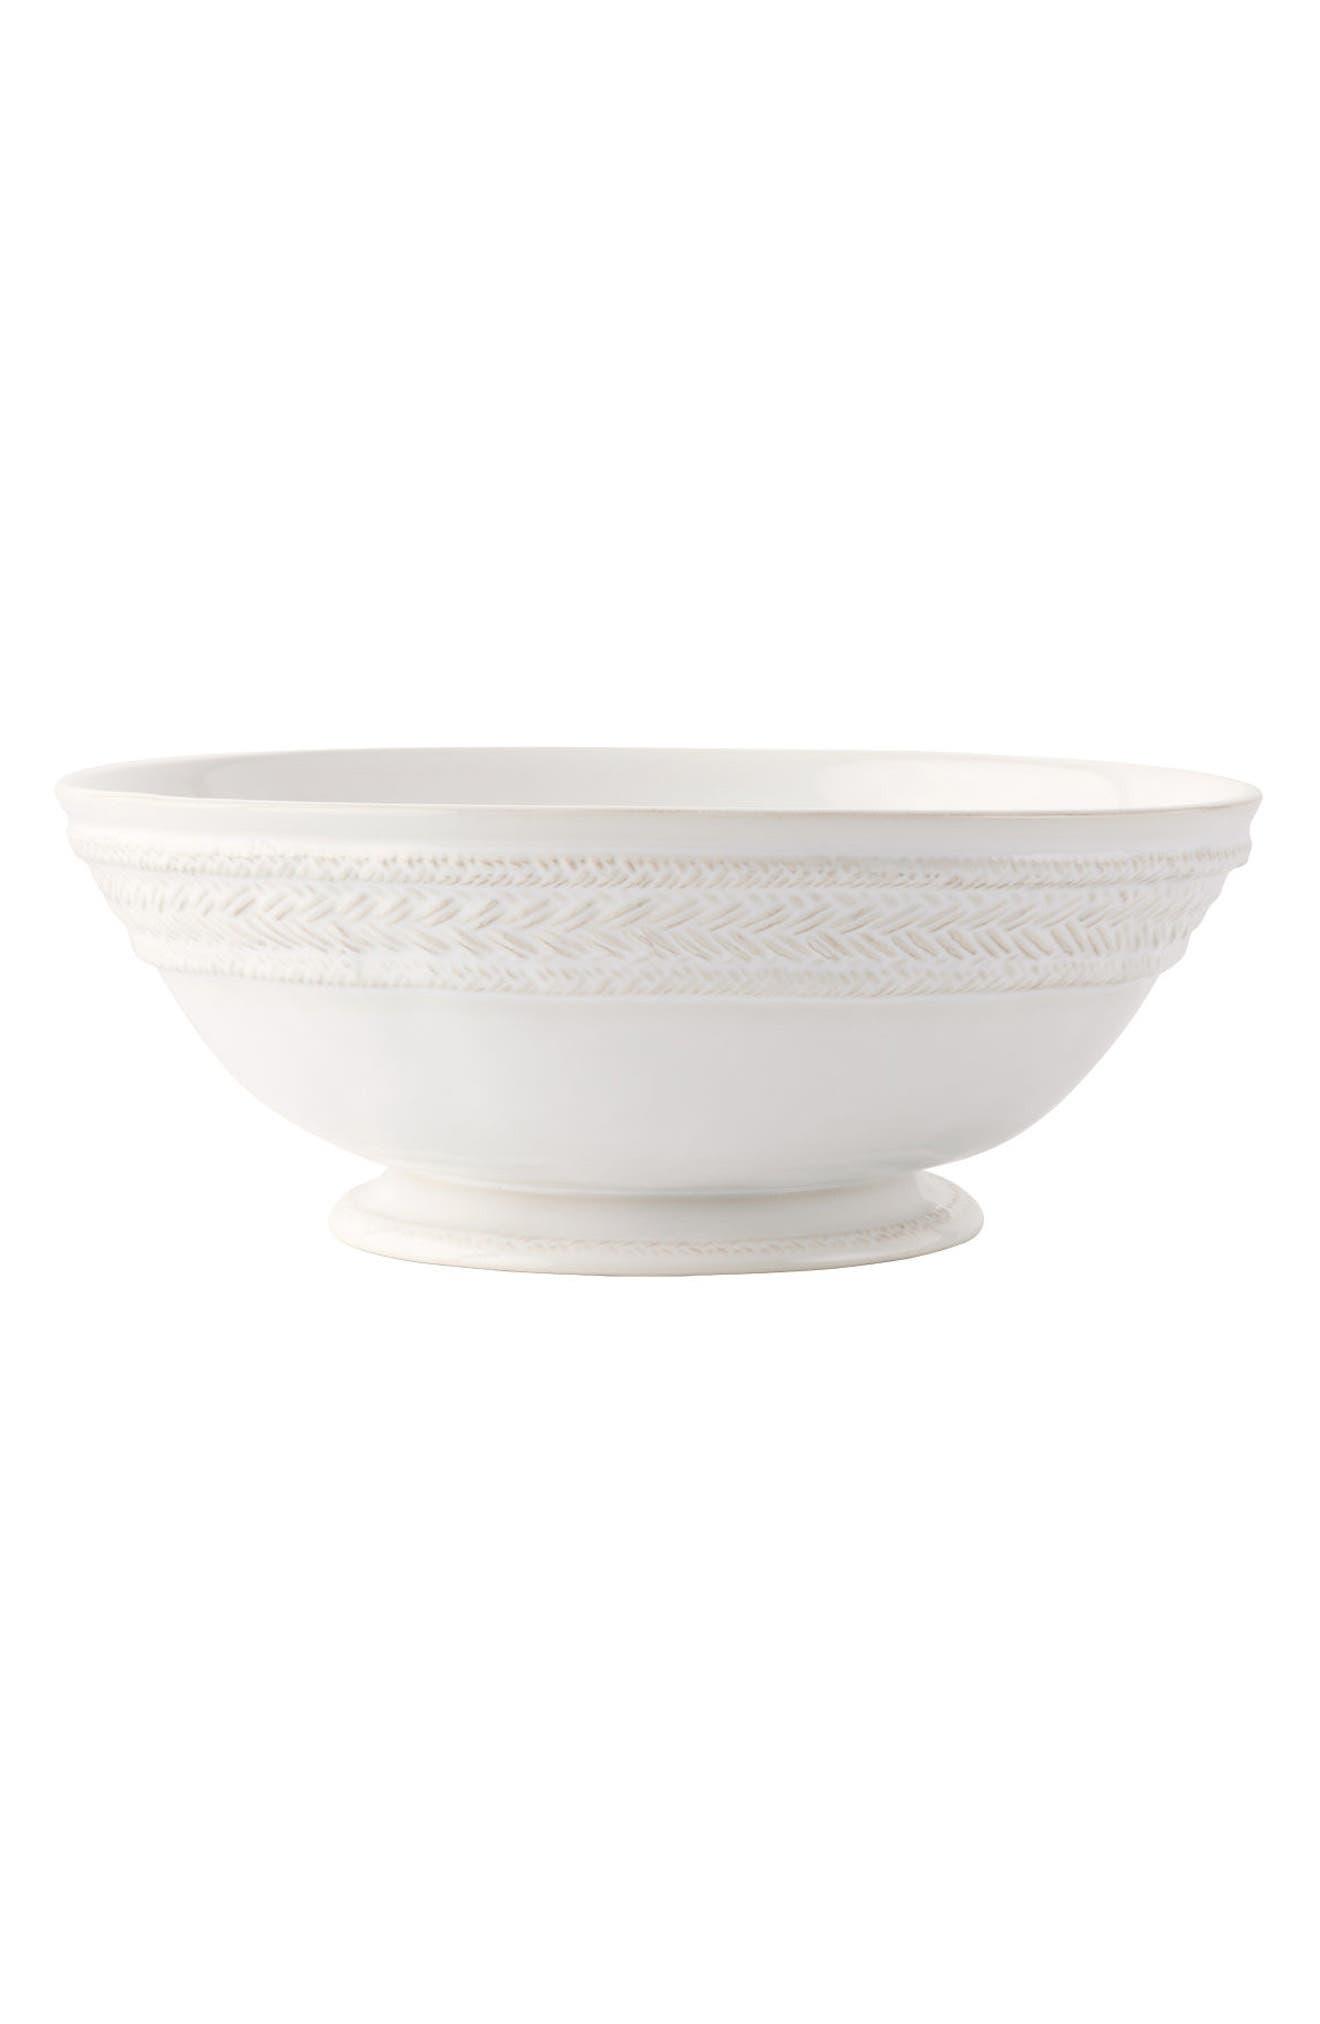 Le Panier Ceramic Fruit Bowl,                             Alternate thumbnail 2, color,                             WHITE